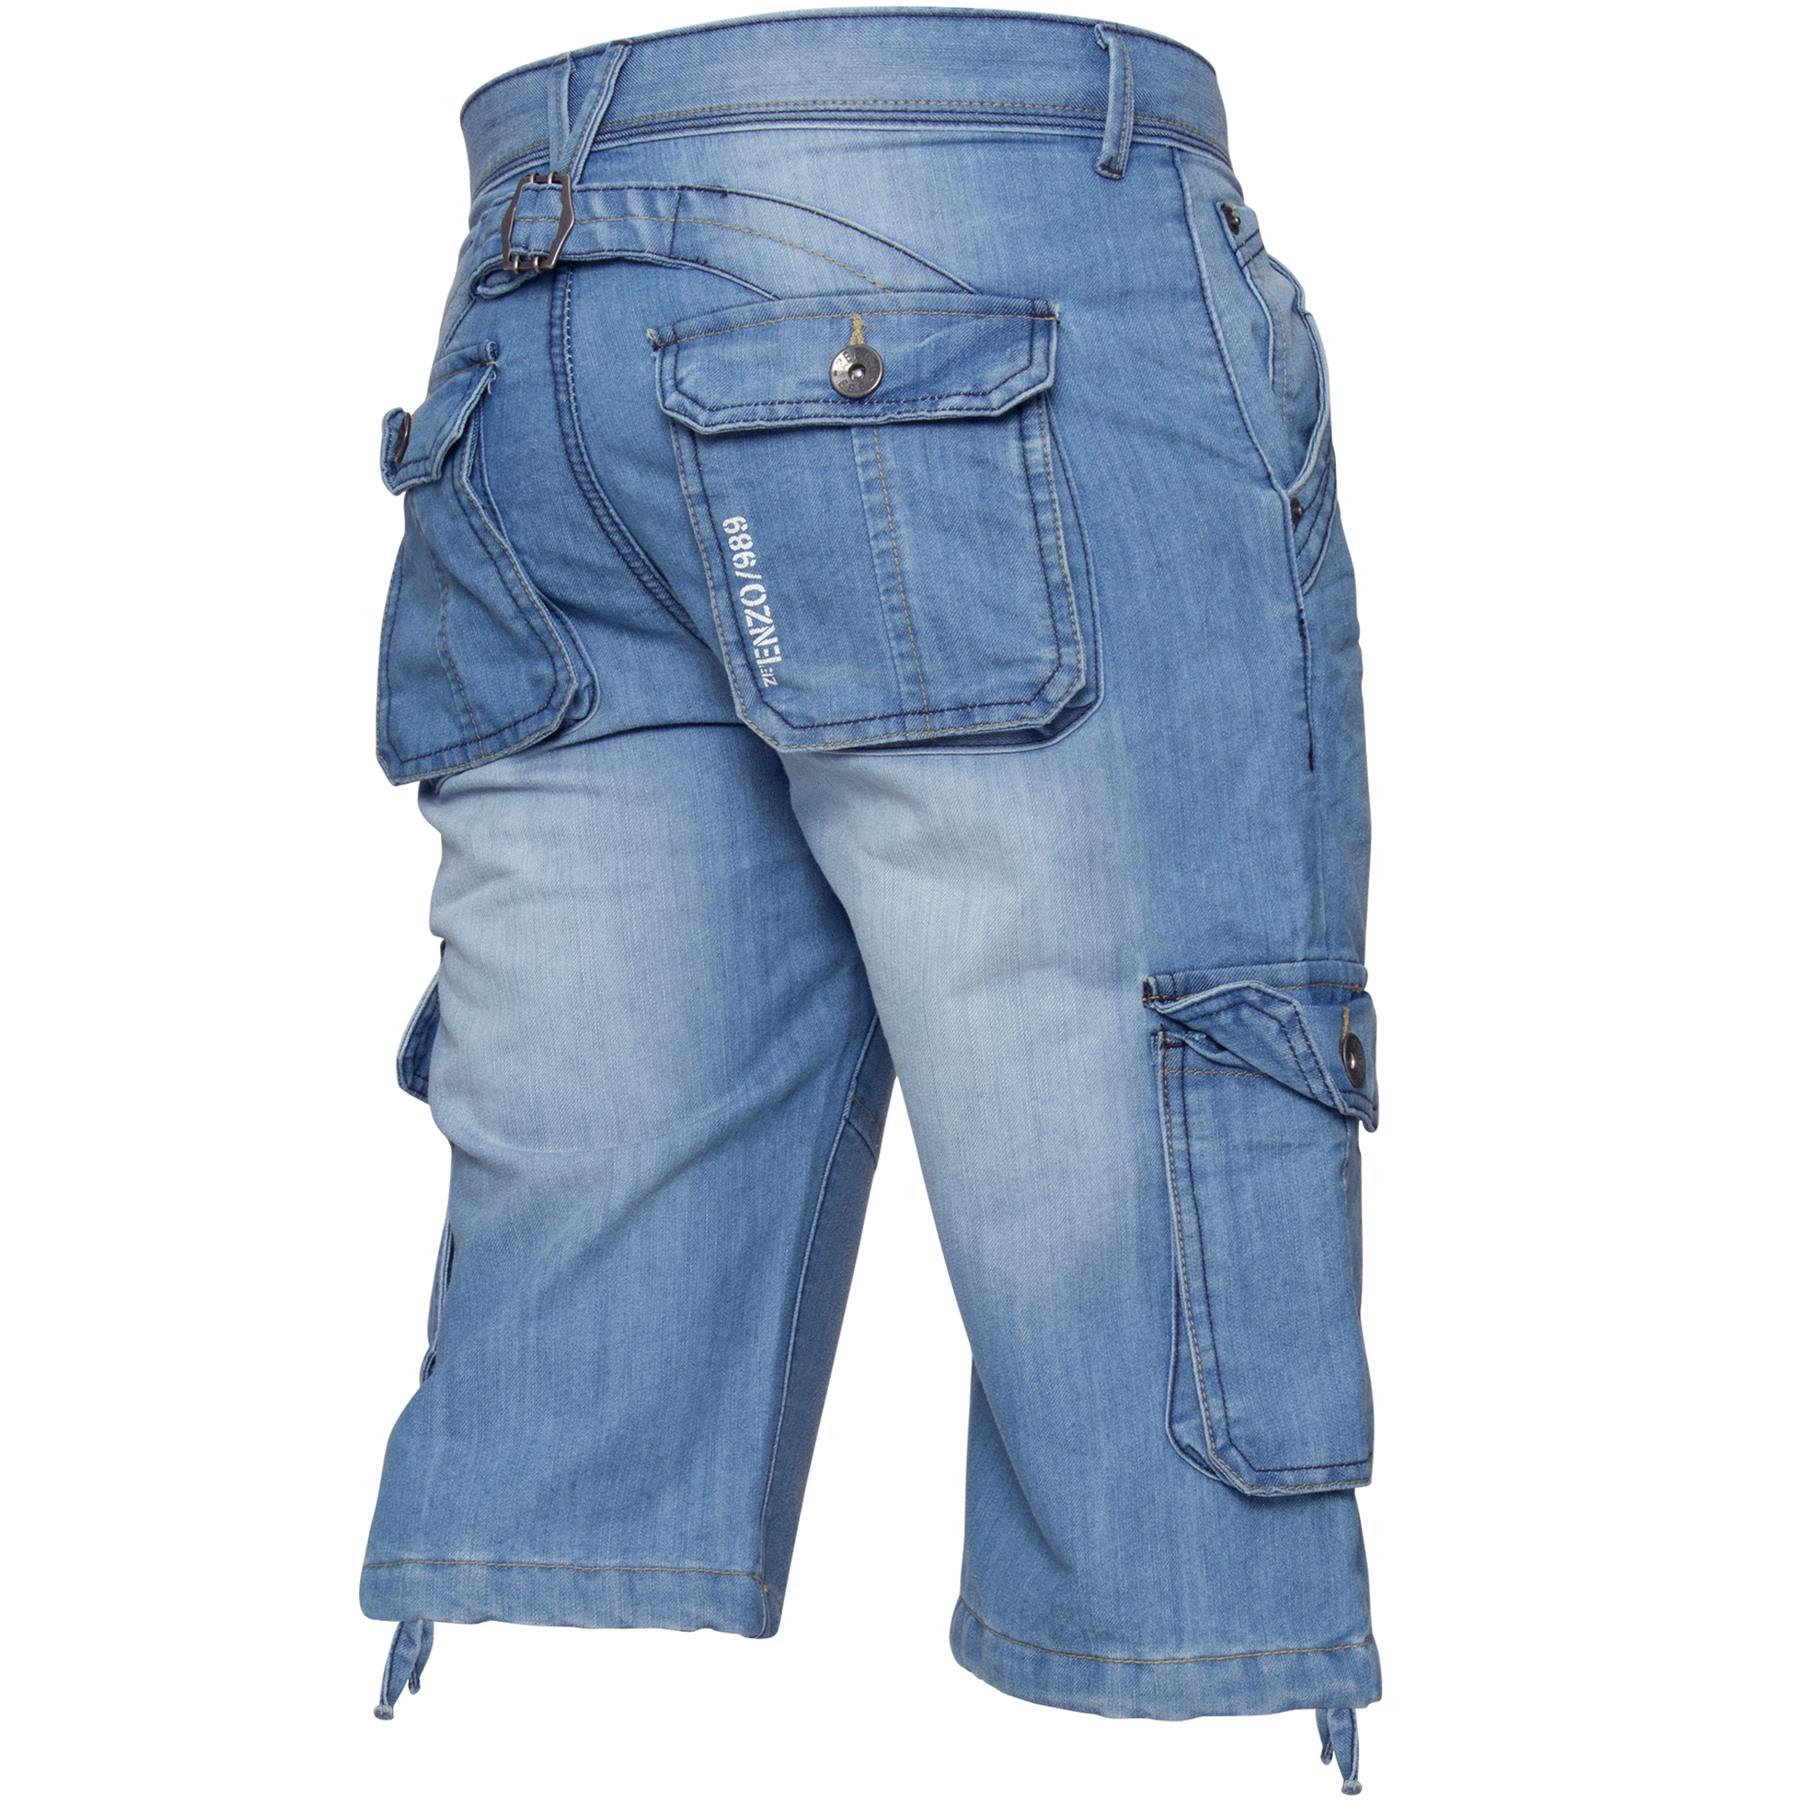 ENZO-Jeans-para-hombre-de-carga-combate-informal-de-verano-Shorts-Pantalones-Cortos-de-Jeans-Todas miniatura 9